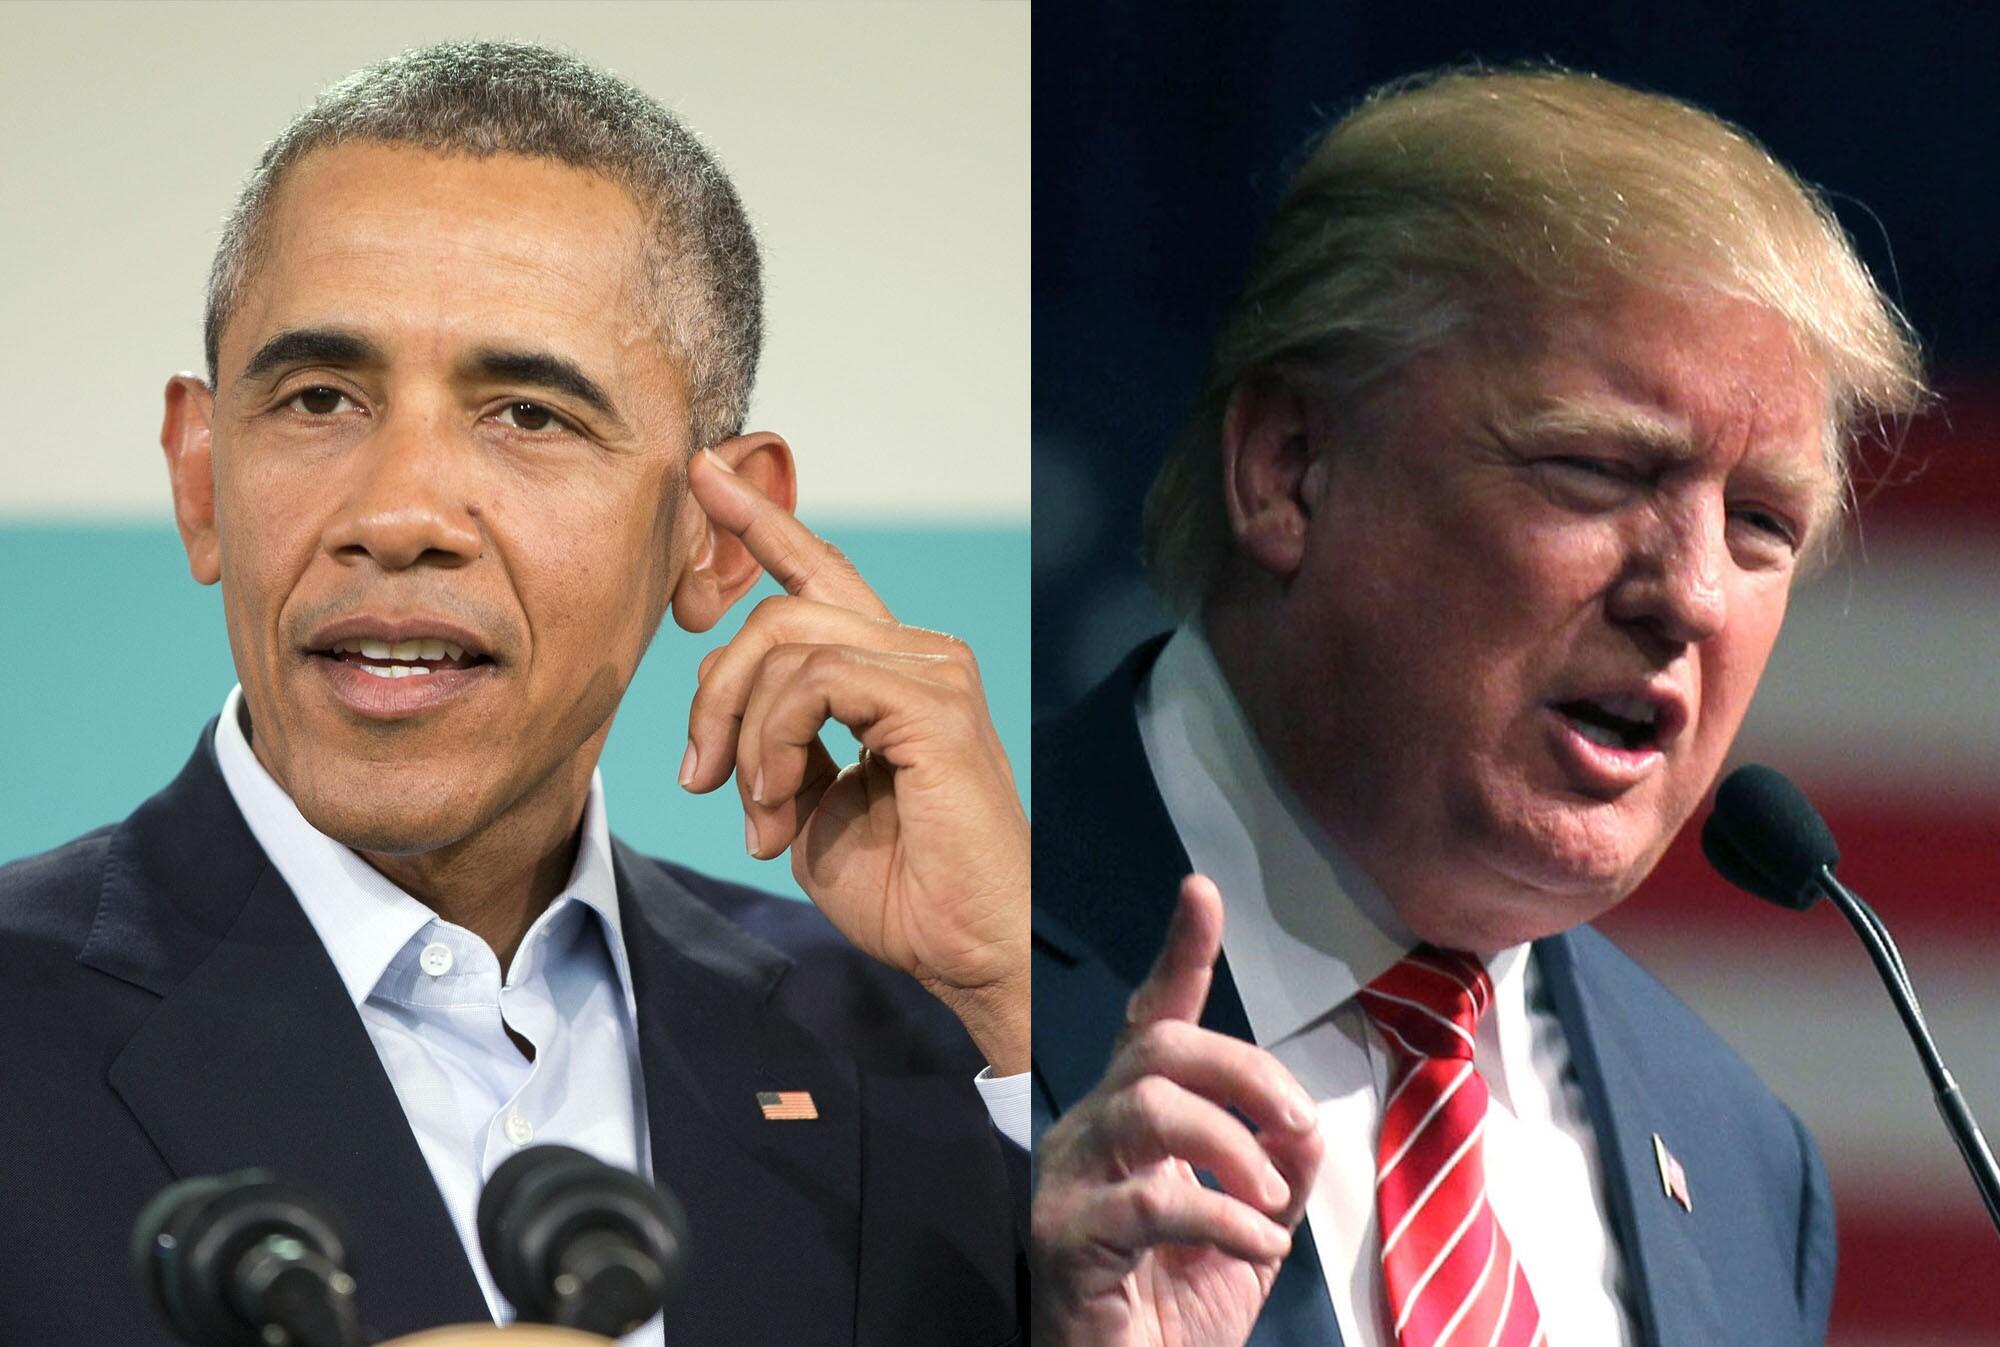 Delightful: Trump killing Obama-era 'shadow' regulations, ends 'deep state bullying' ?url=https%3A%2F%2Fmediadc.brightspotcdn.com%2F5a%2F04%2F1cd434a76da74716736821ae440c%2Fc2e4ef1f0054808f8f6caa1d7bdc718a